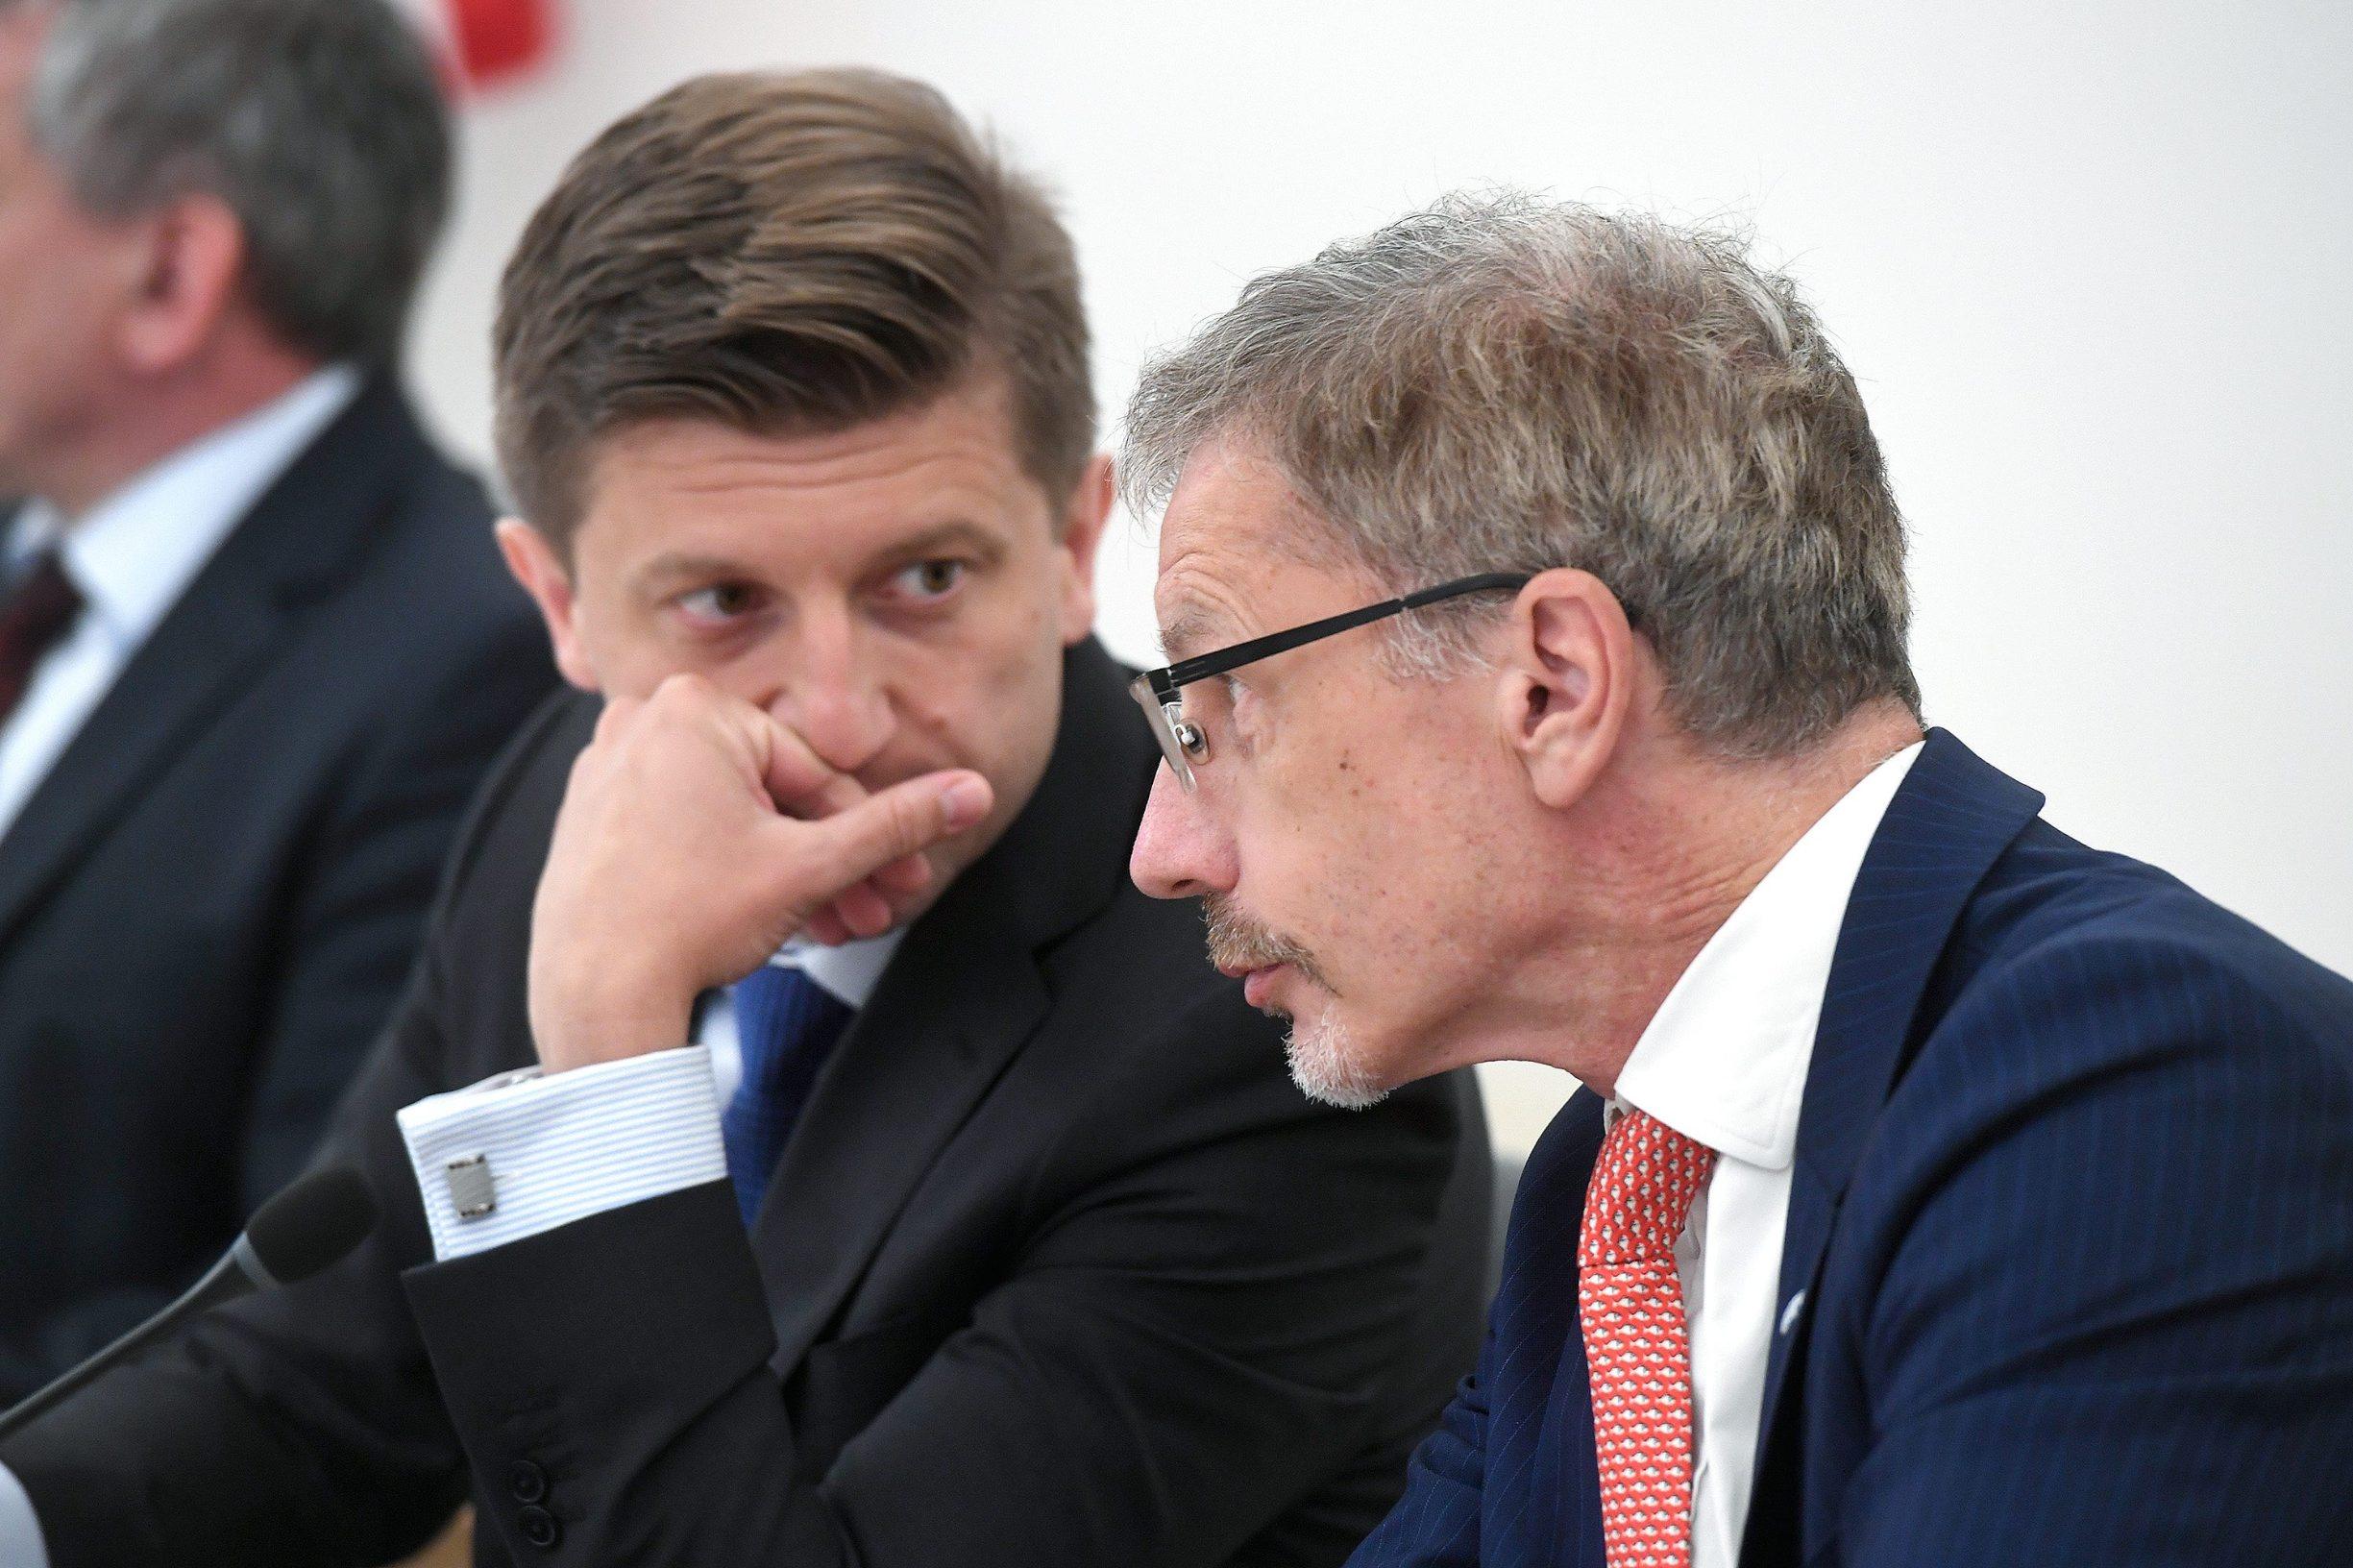 Ministar financija Zdravko Marić i guverner HNB-a Boris Vujčić